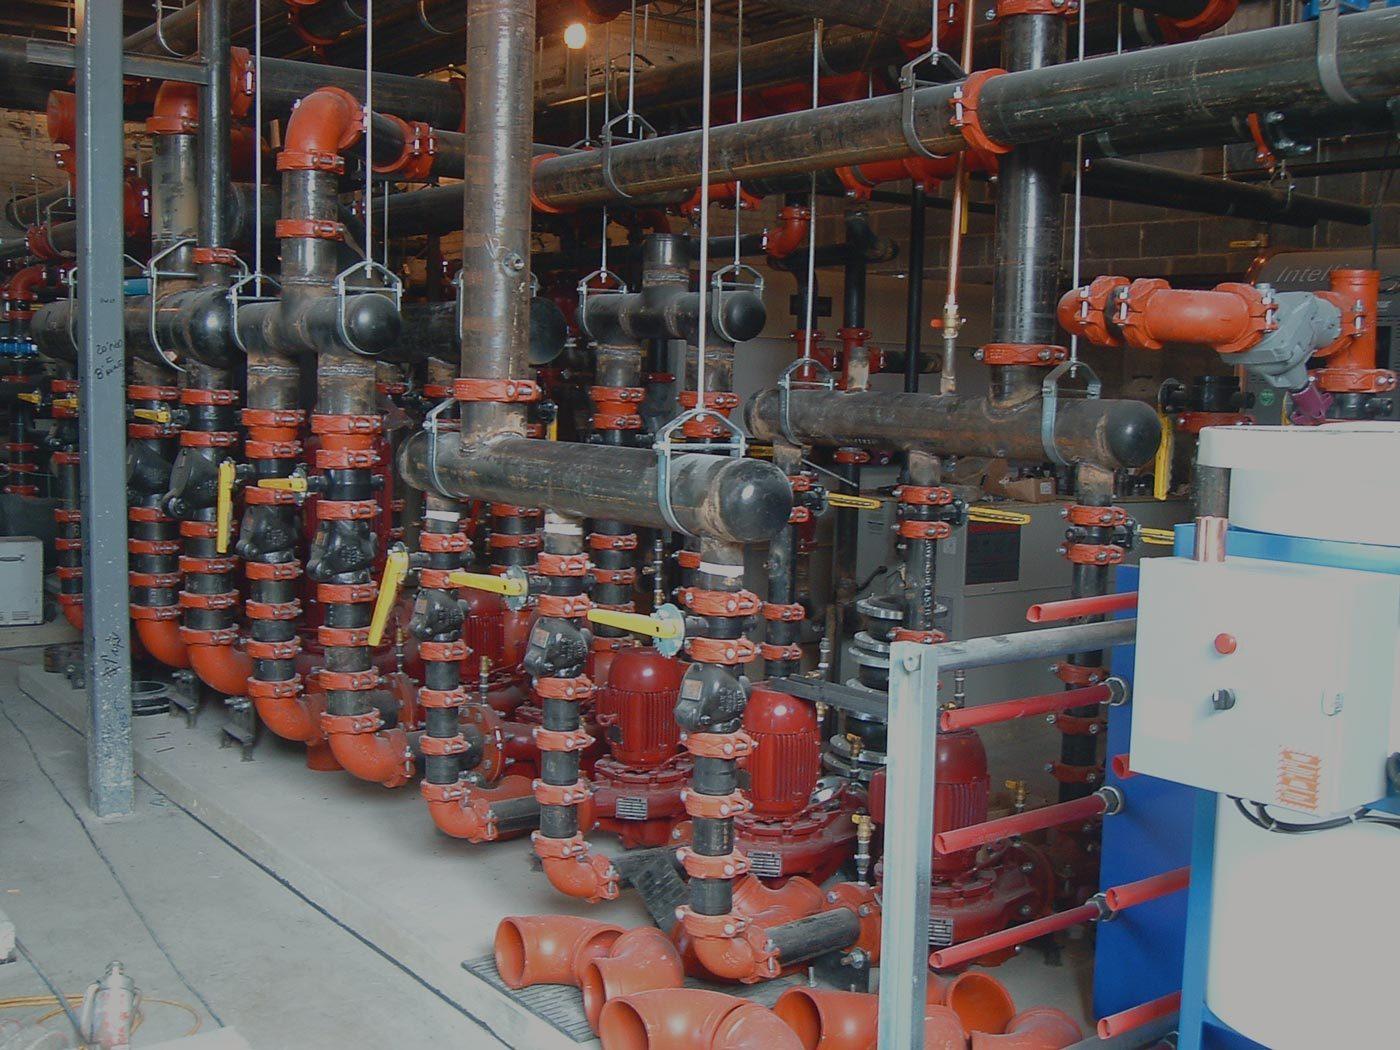 mechanical-and-industries.jpg#asset:73845